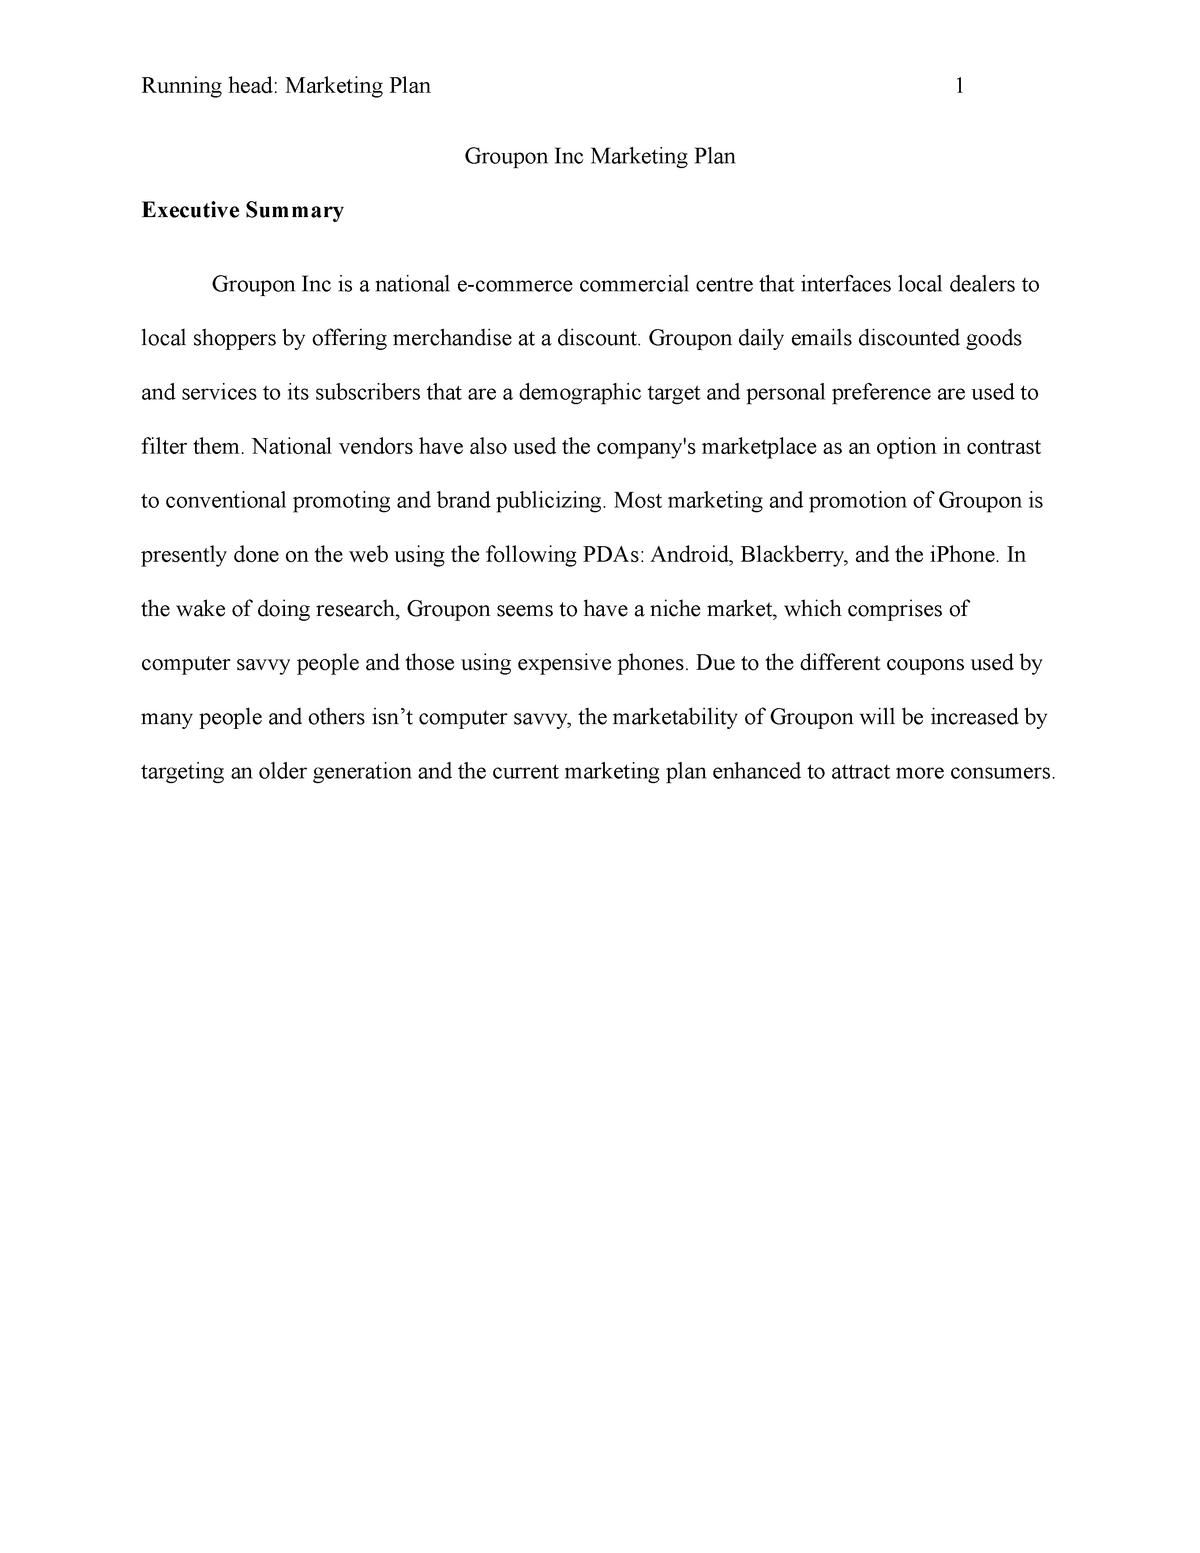 Marketing plan - MKT-607: Marketing Management - StuDocu